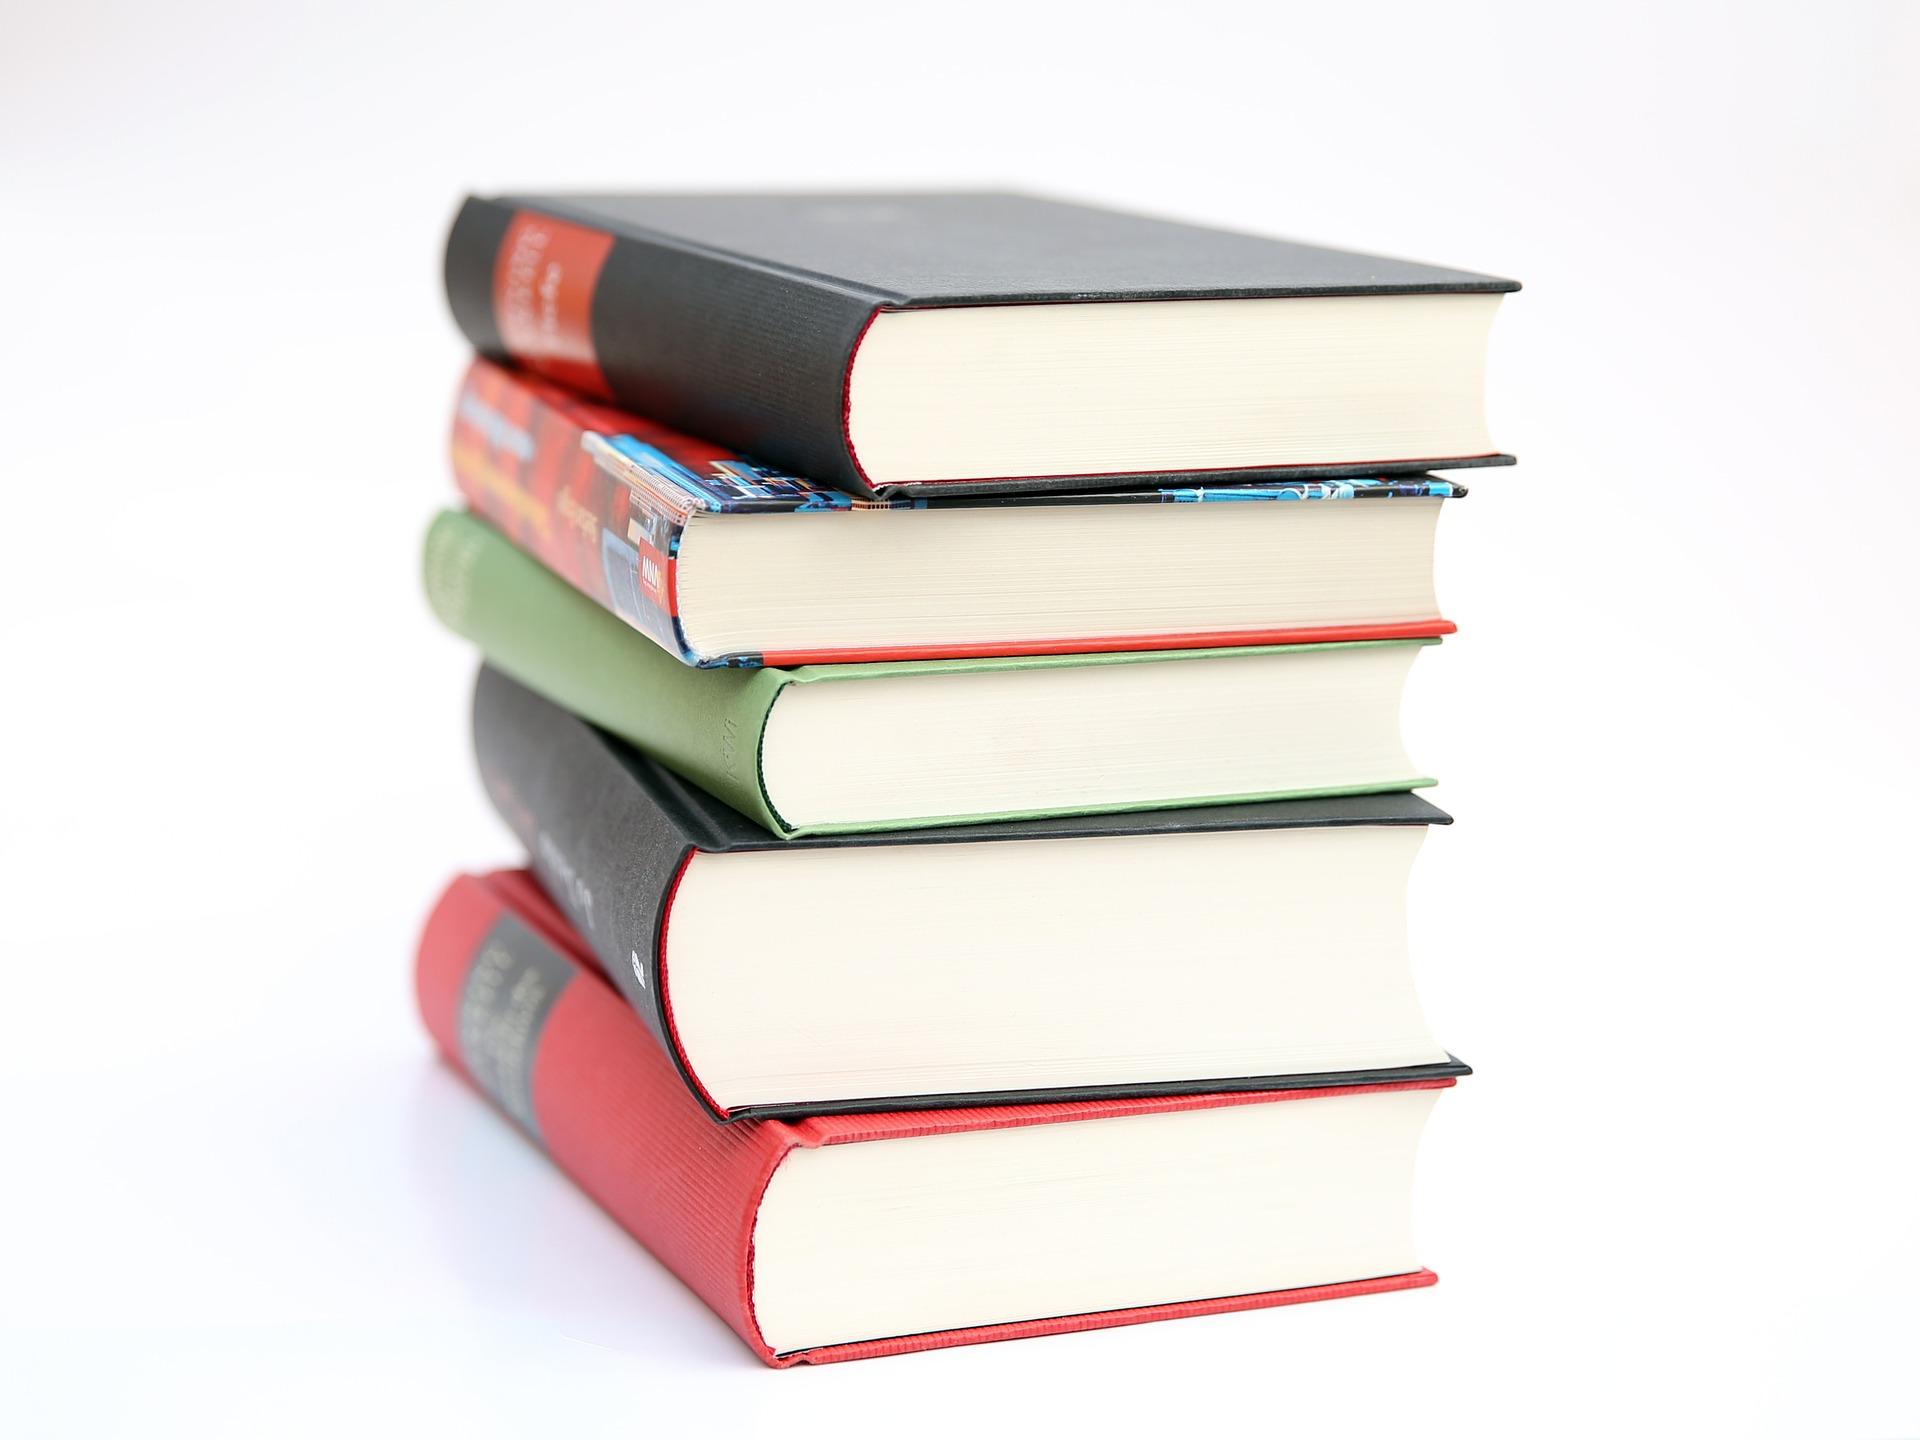 خمس كتب لابد من قراءتها